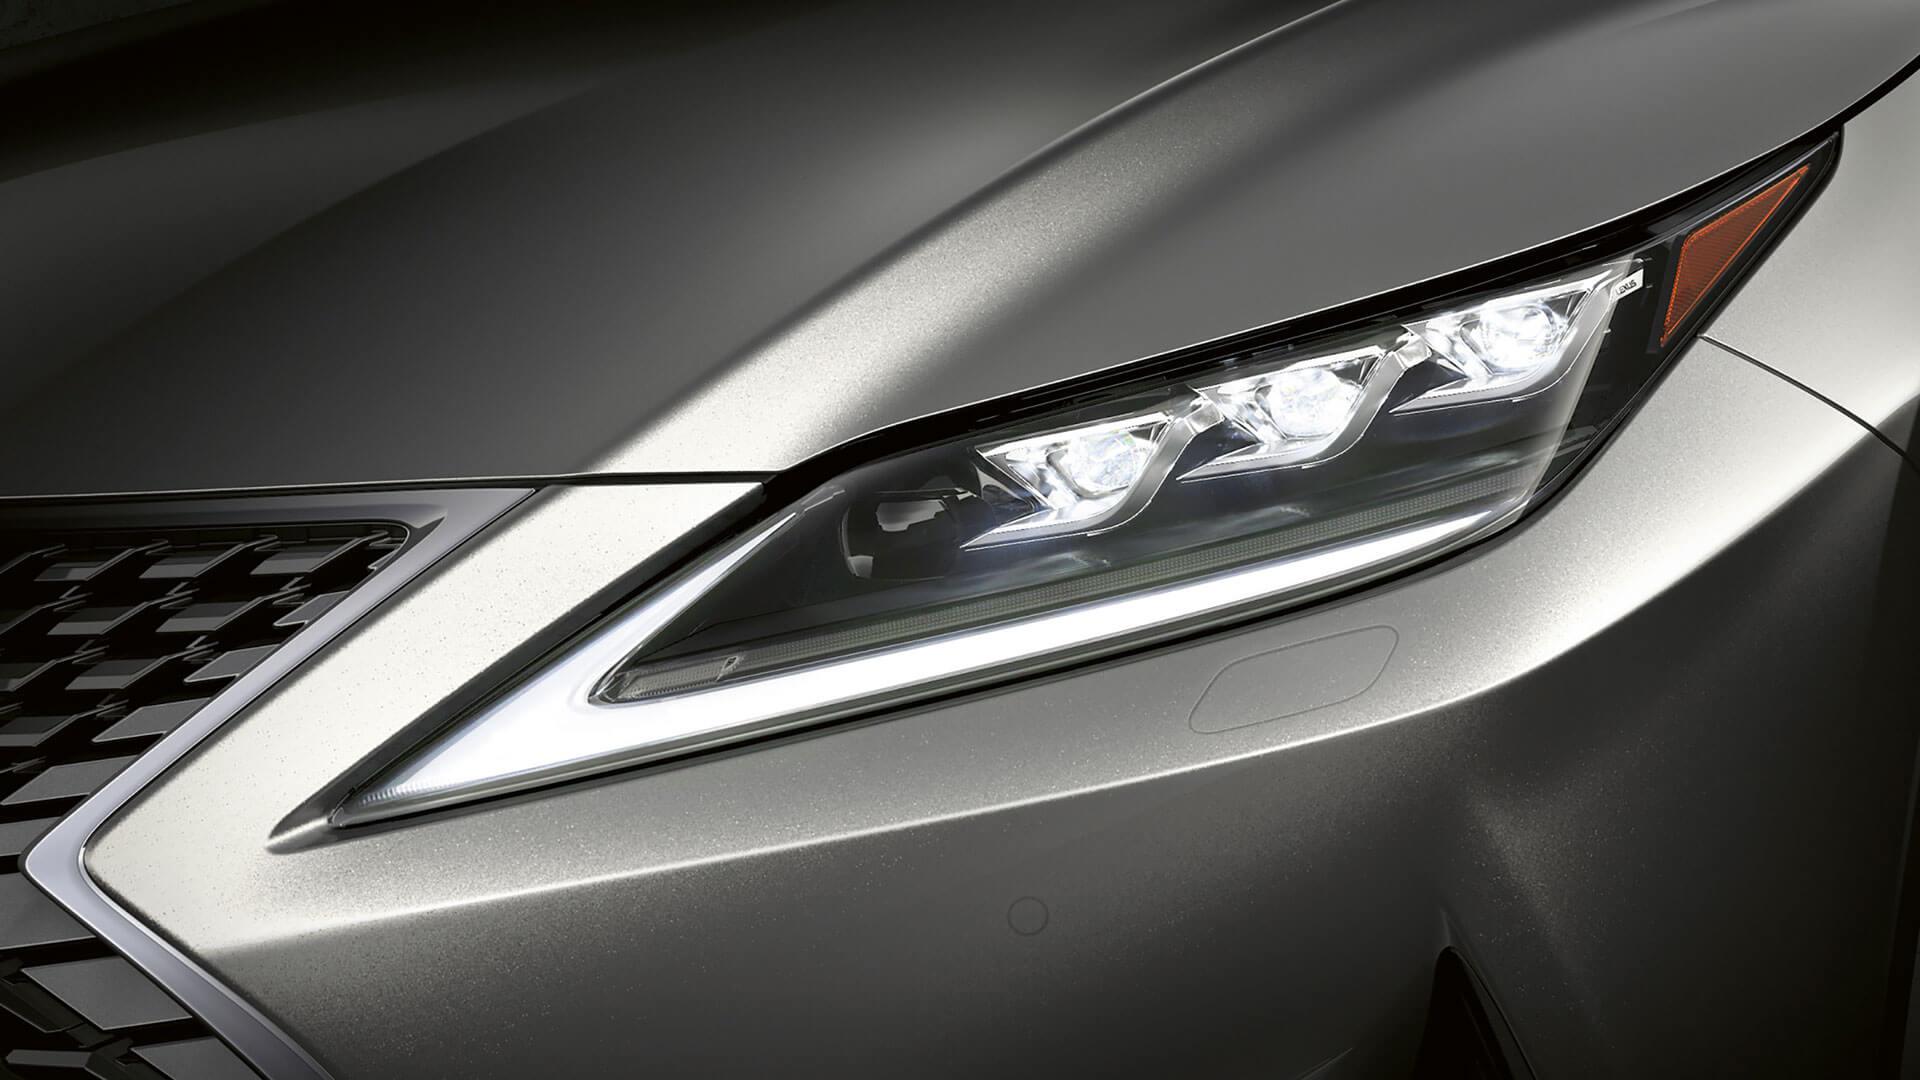 2019 lexus rx hotspot triple led headlights